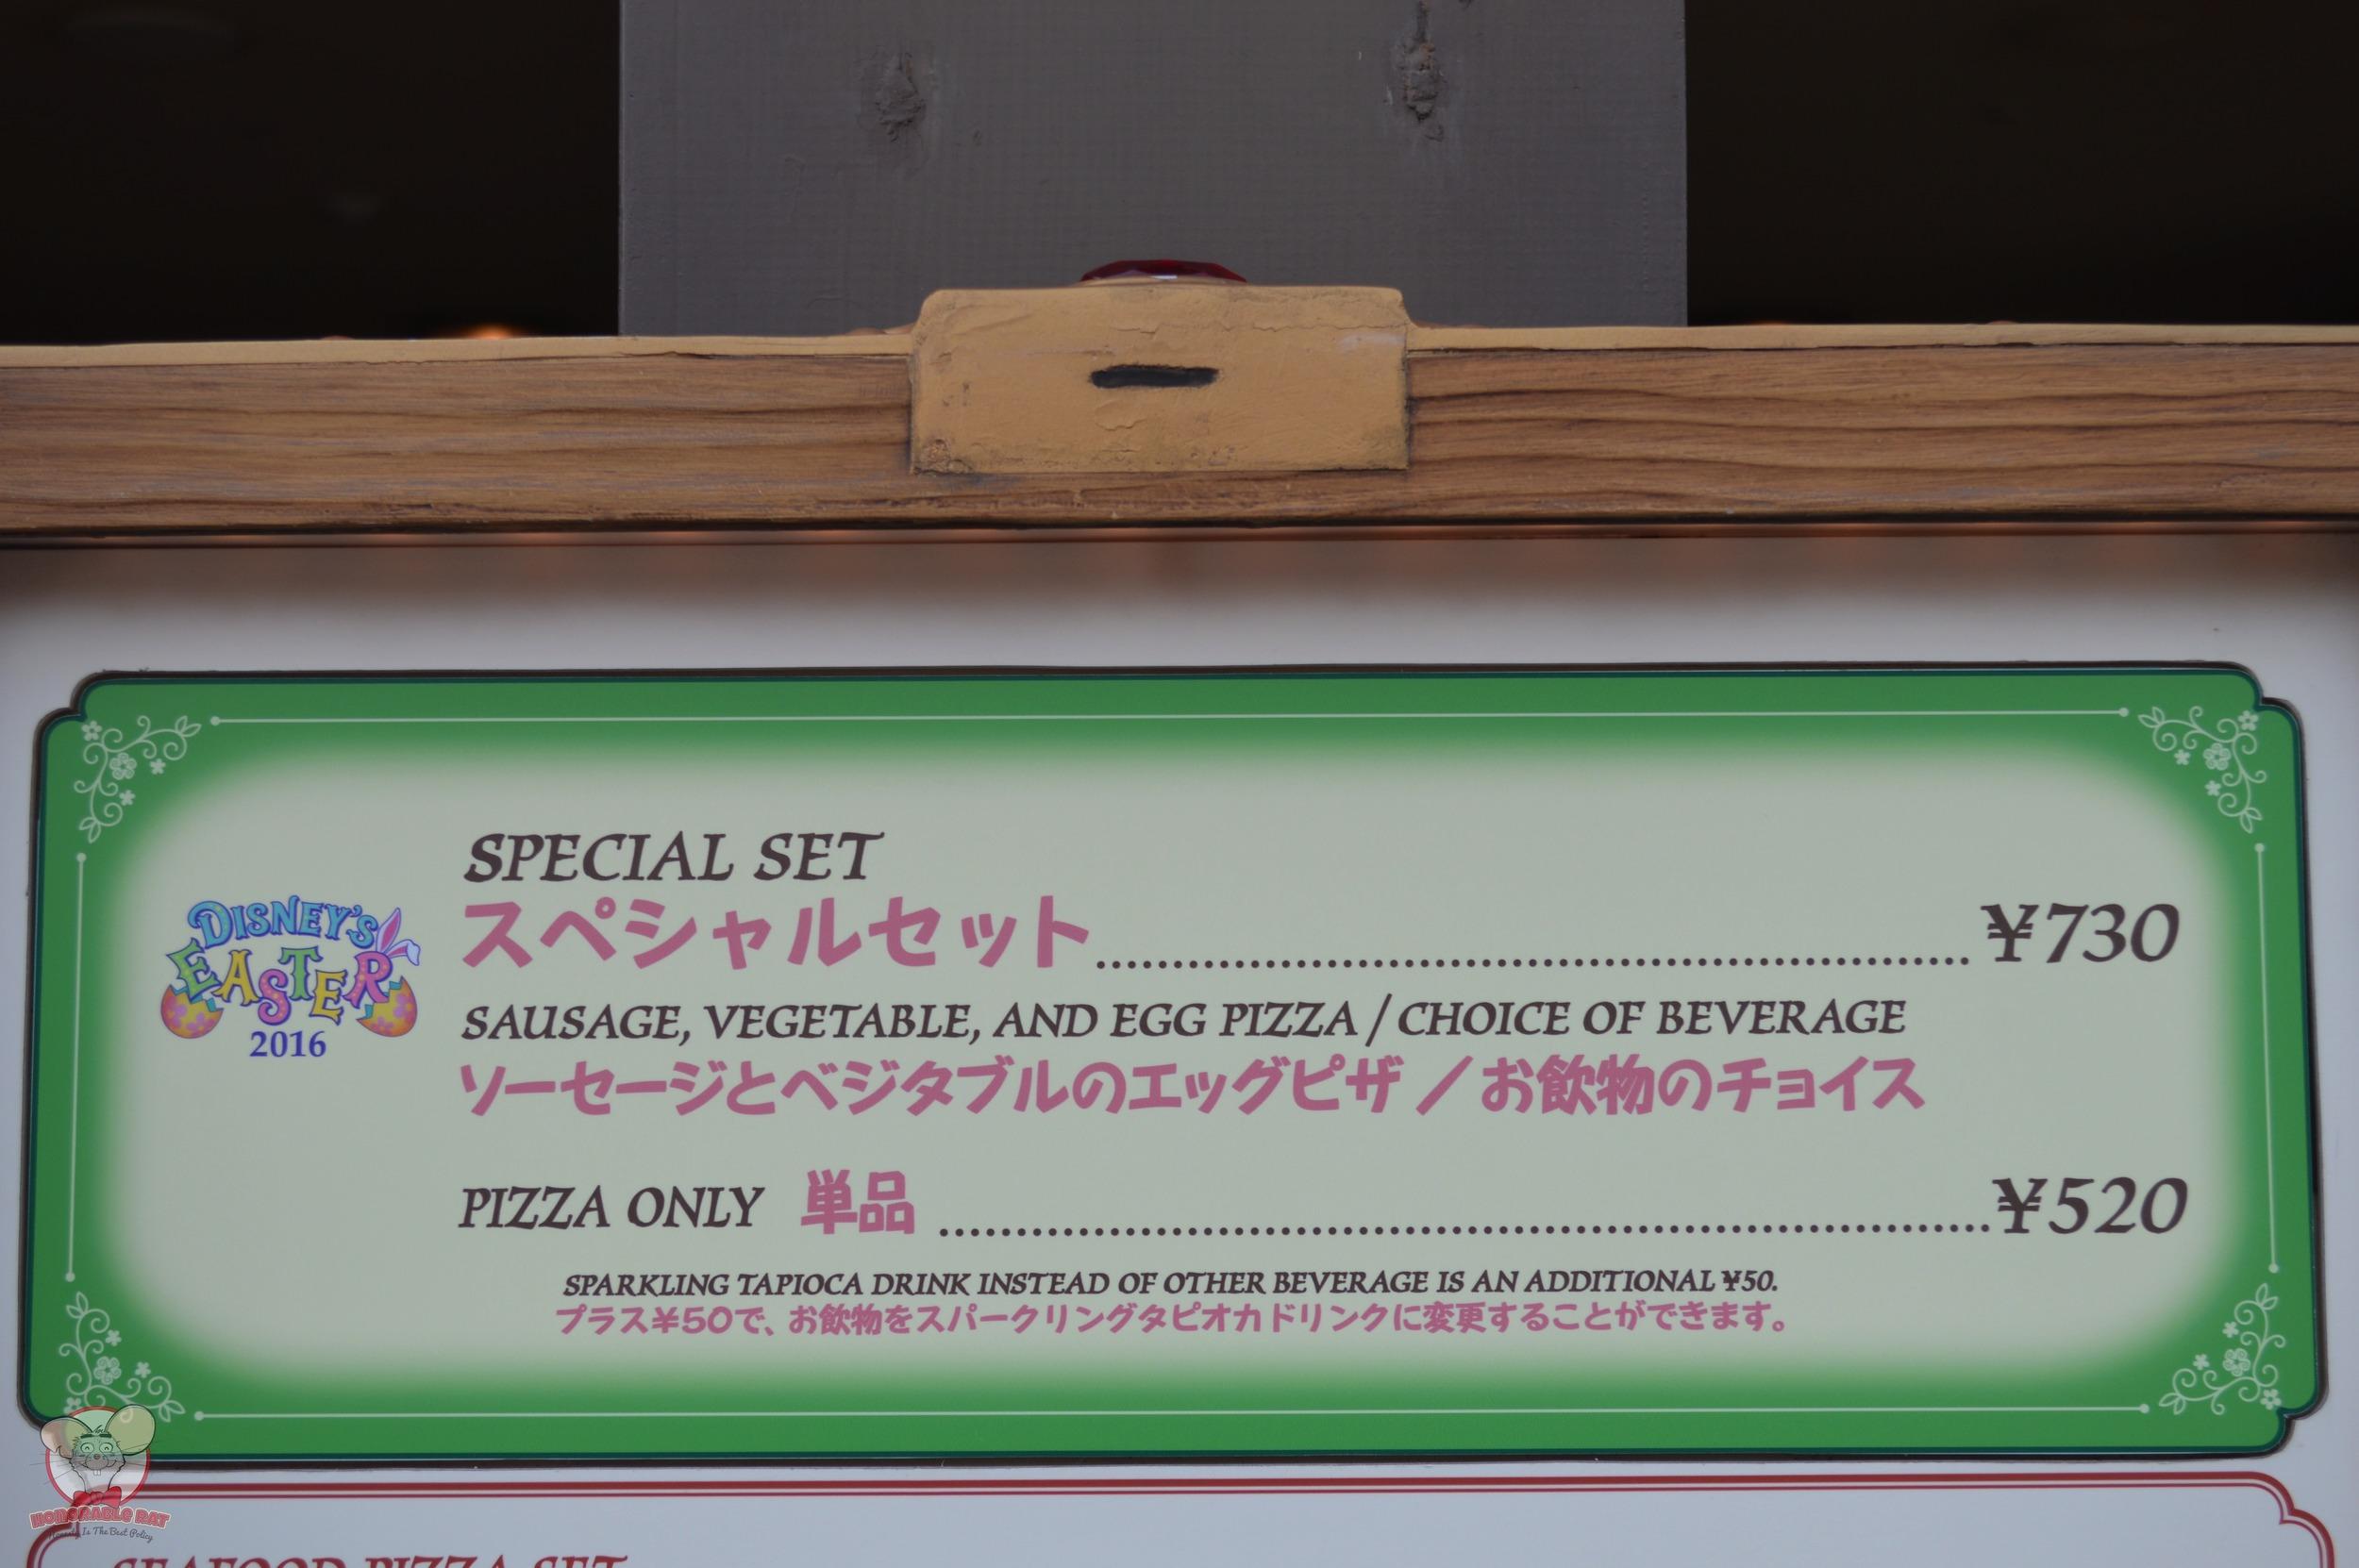 Sausage, Vegetable and Egg Pizza Menu